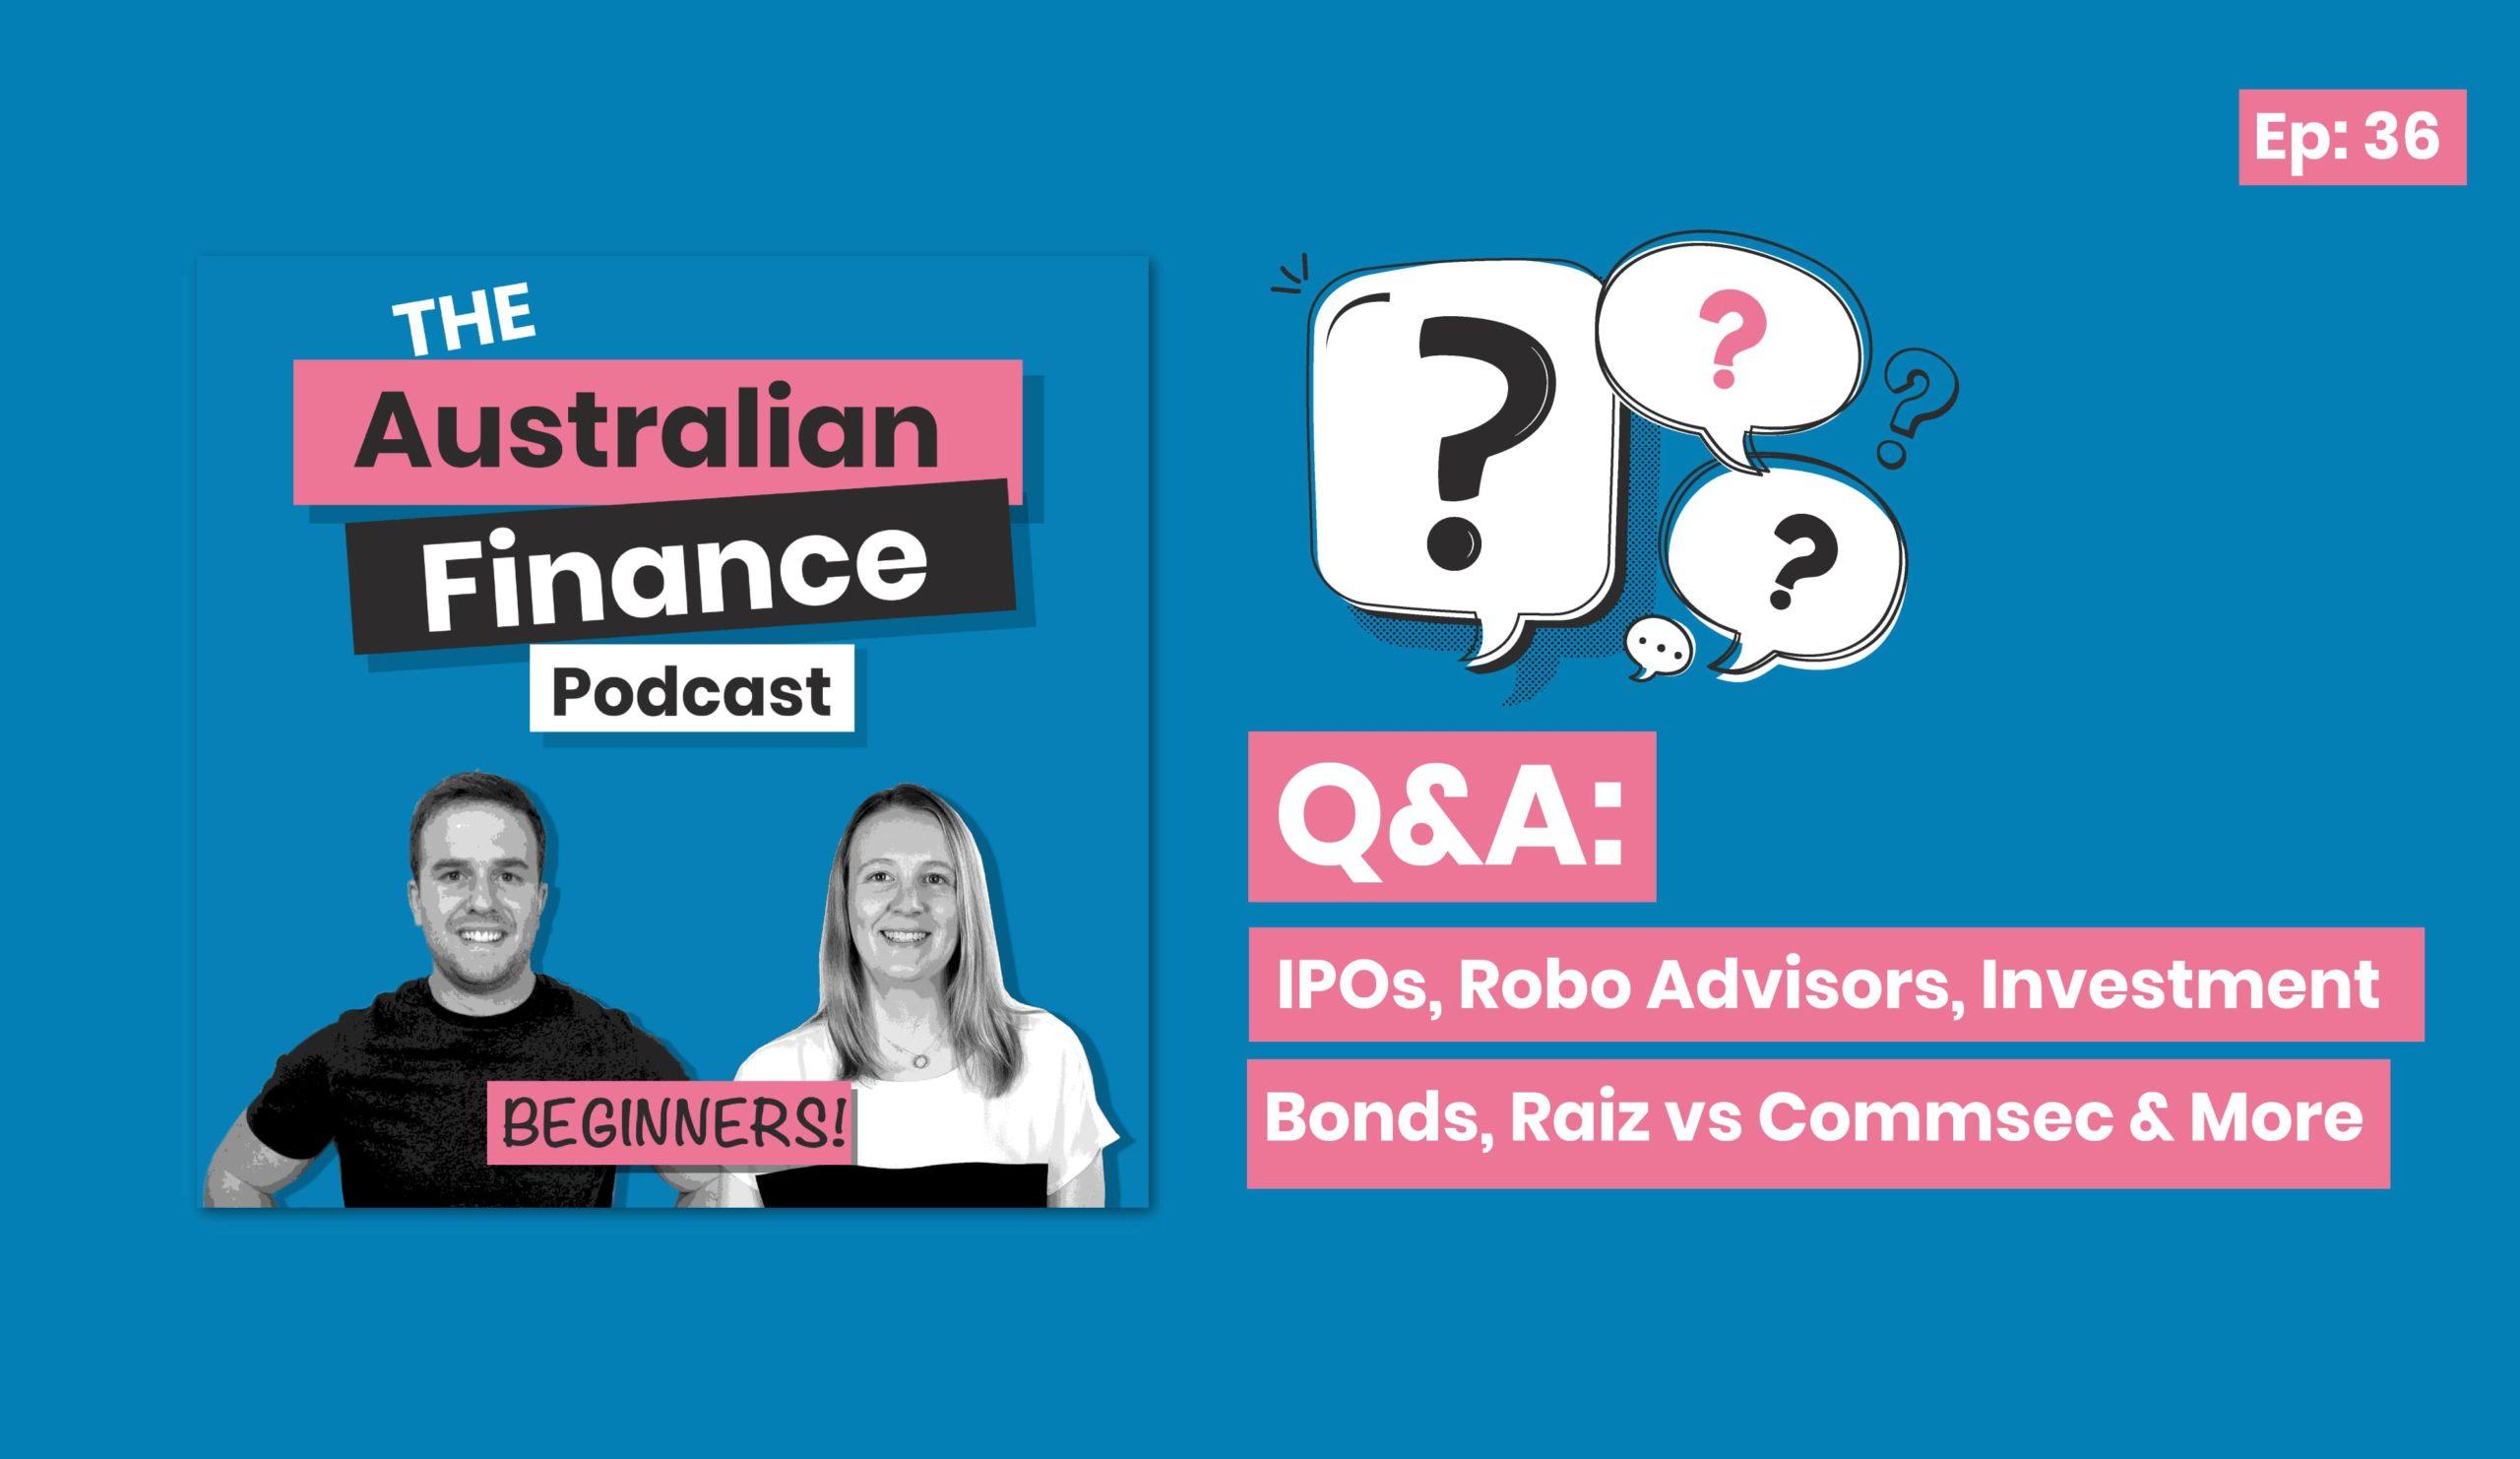 Q+A on The Australian FInance Podcast